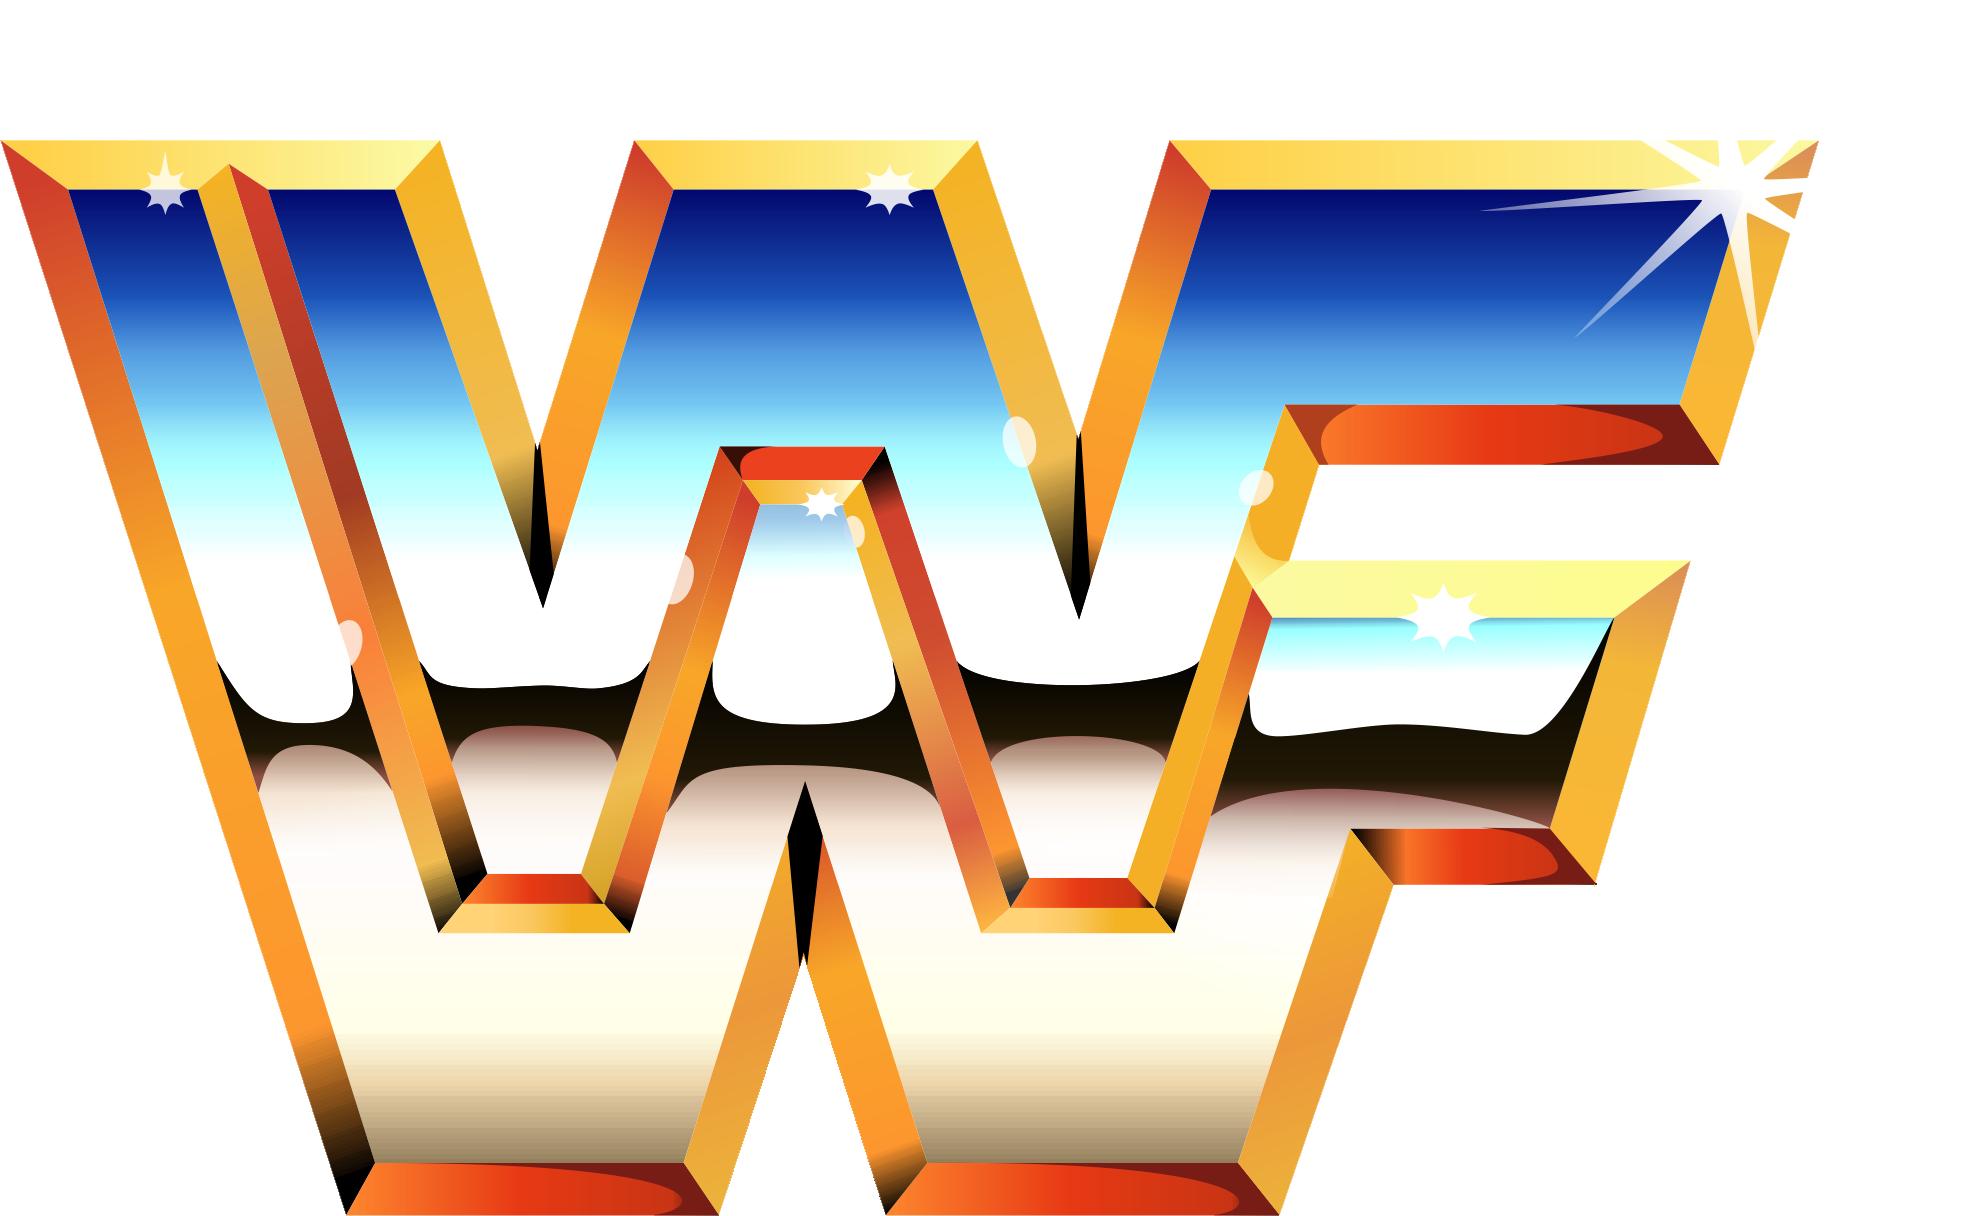 Professional wrestling double-team maneuvers